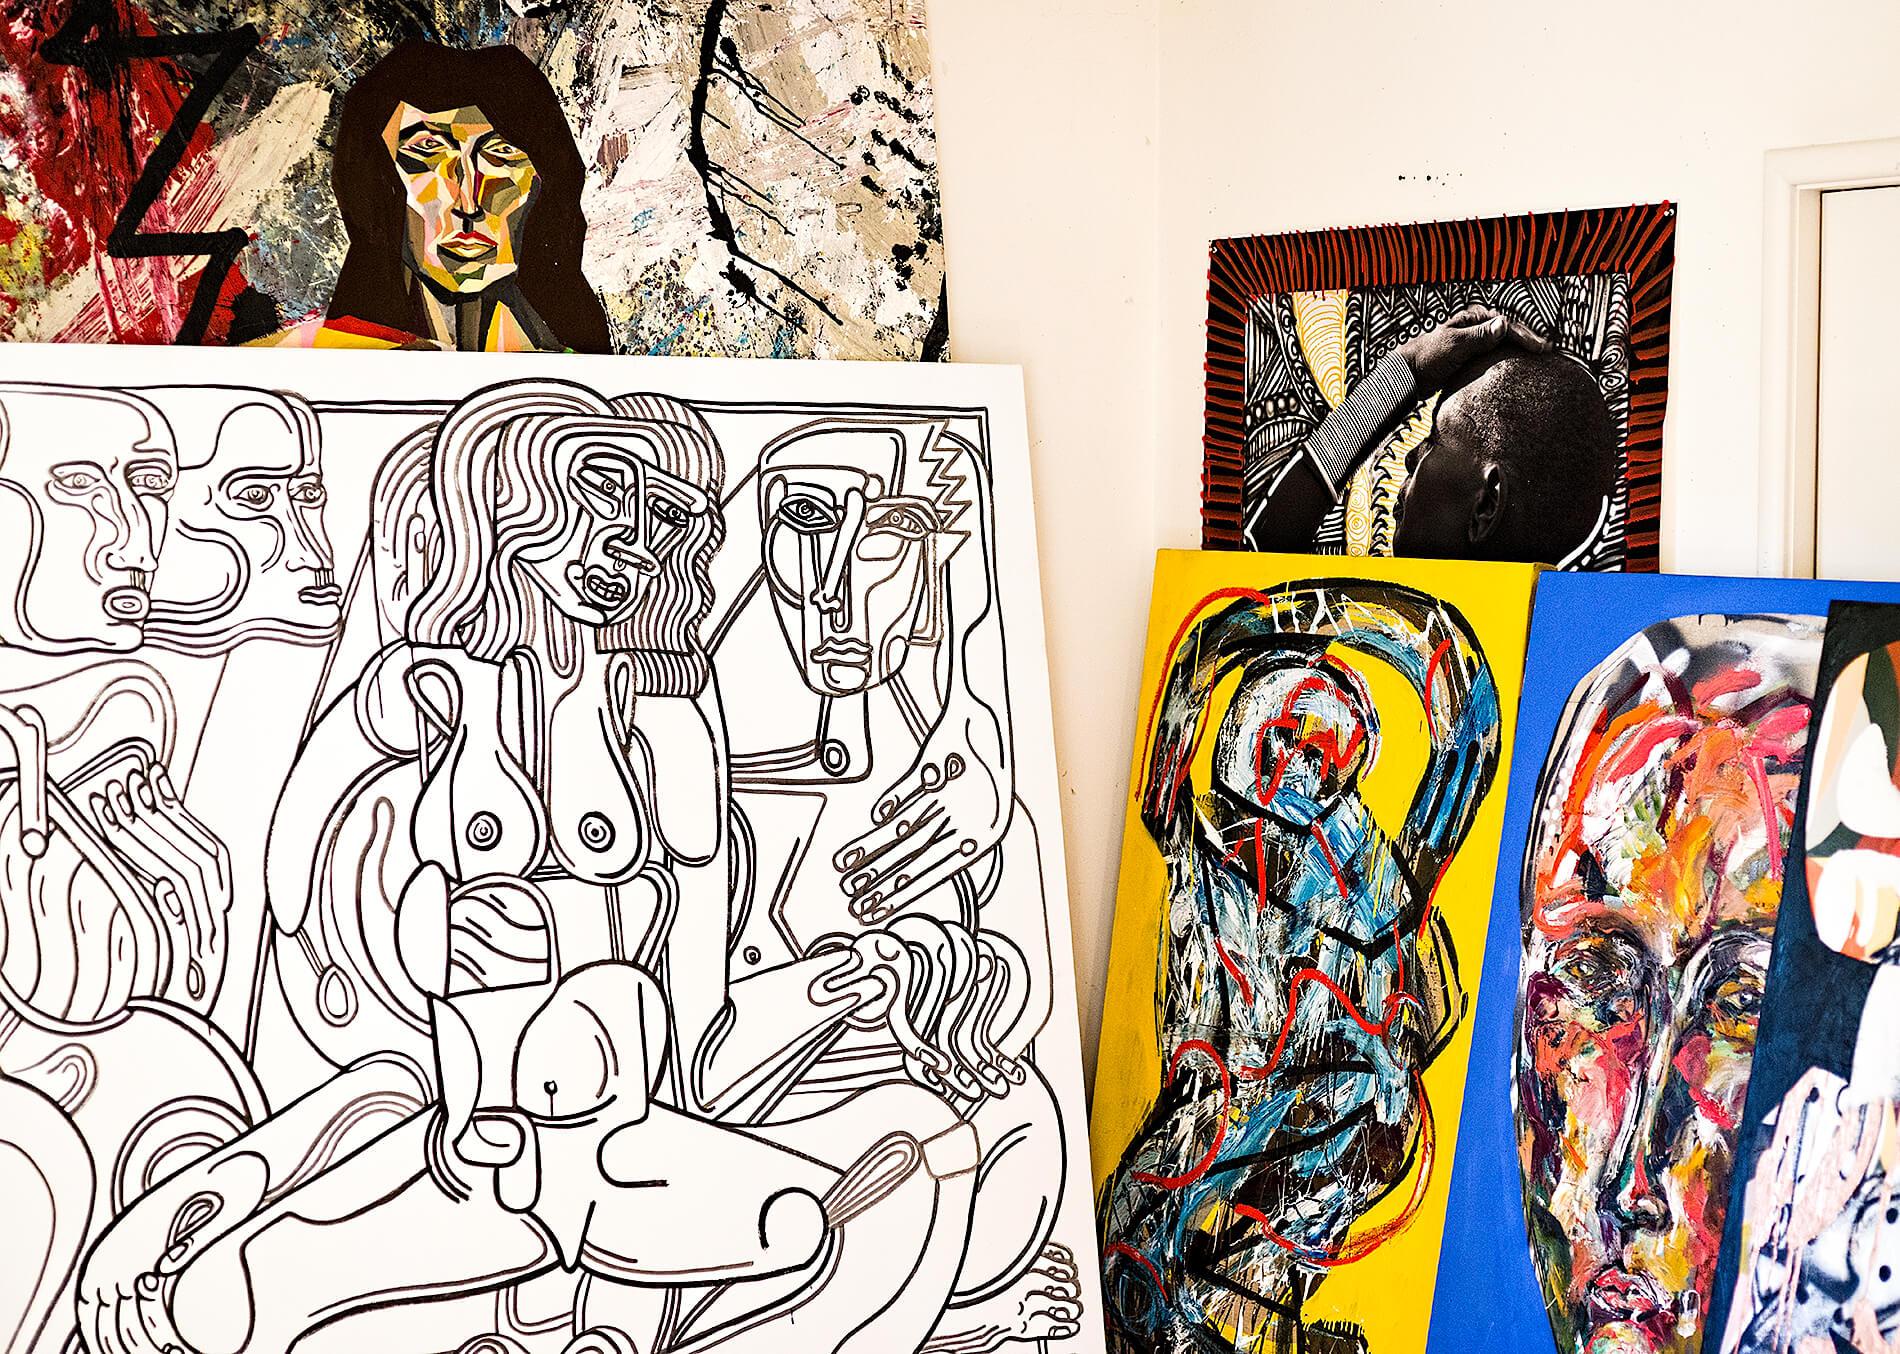 Zio Ziegler paintings